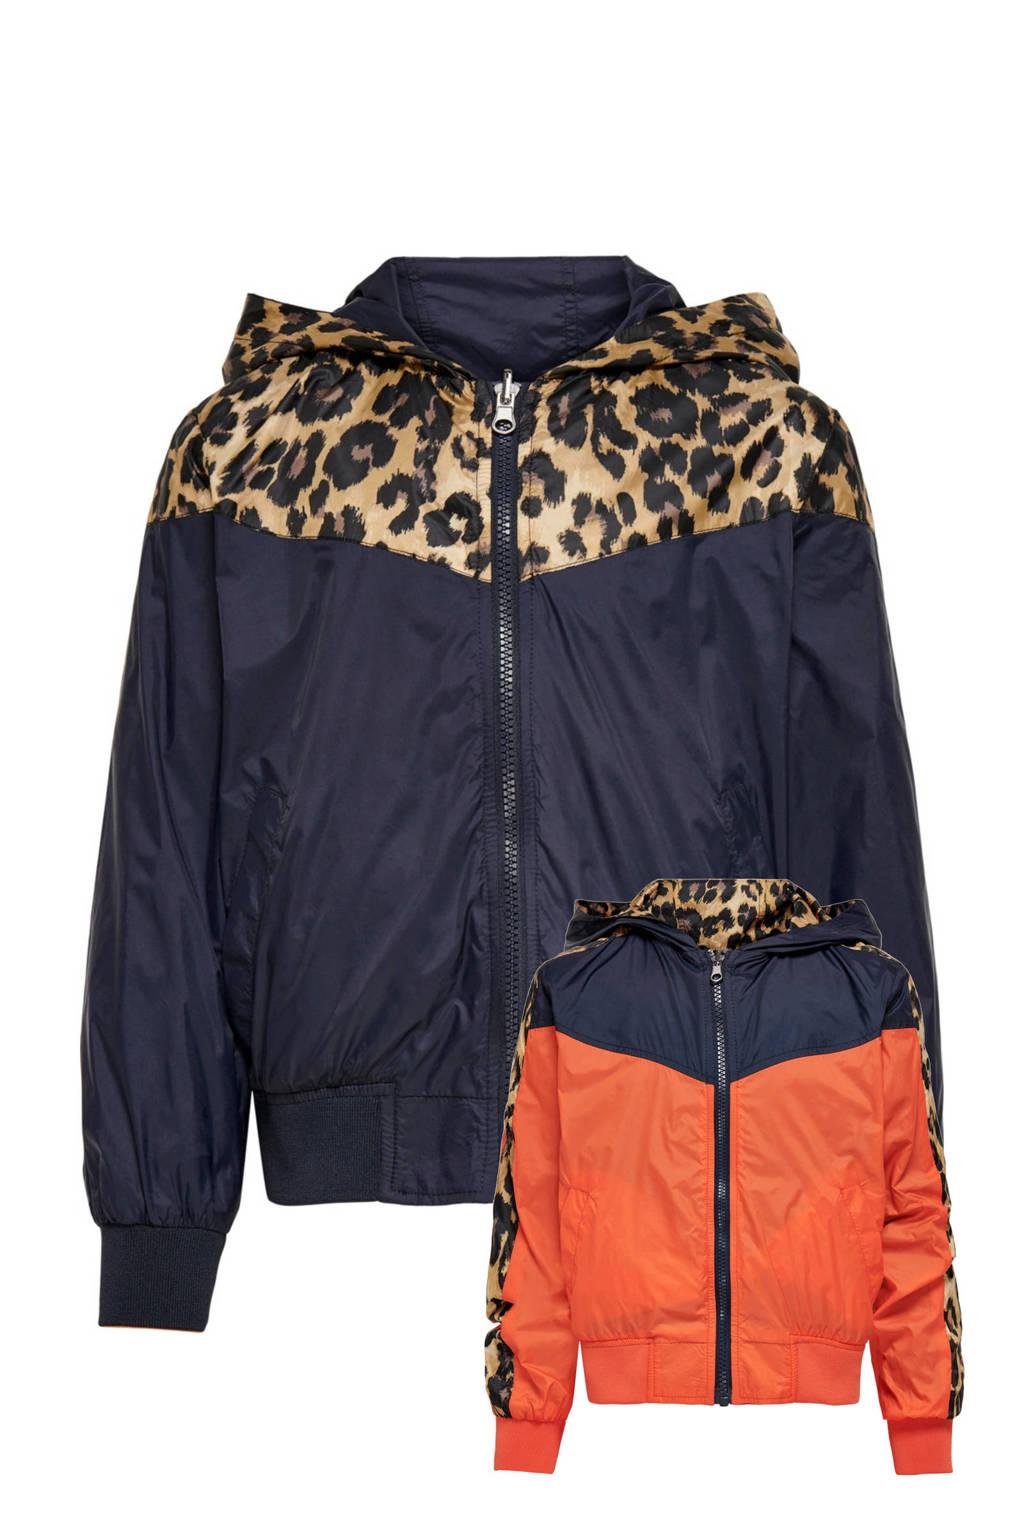 KIDS ONLY reversible  zomerjas Mila met contrastbies donkerblauw/donker oranje/bruin, Donkerblauw/donker oranje/bruin